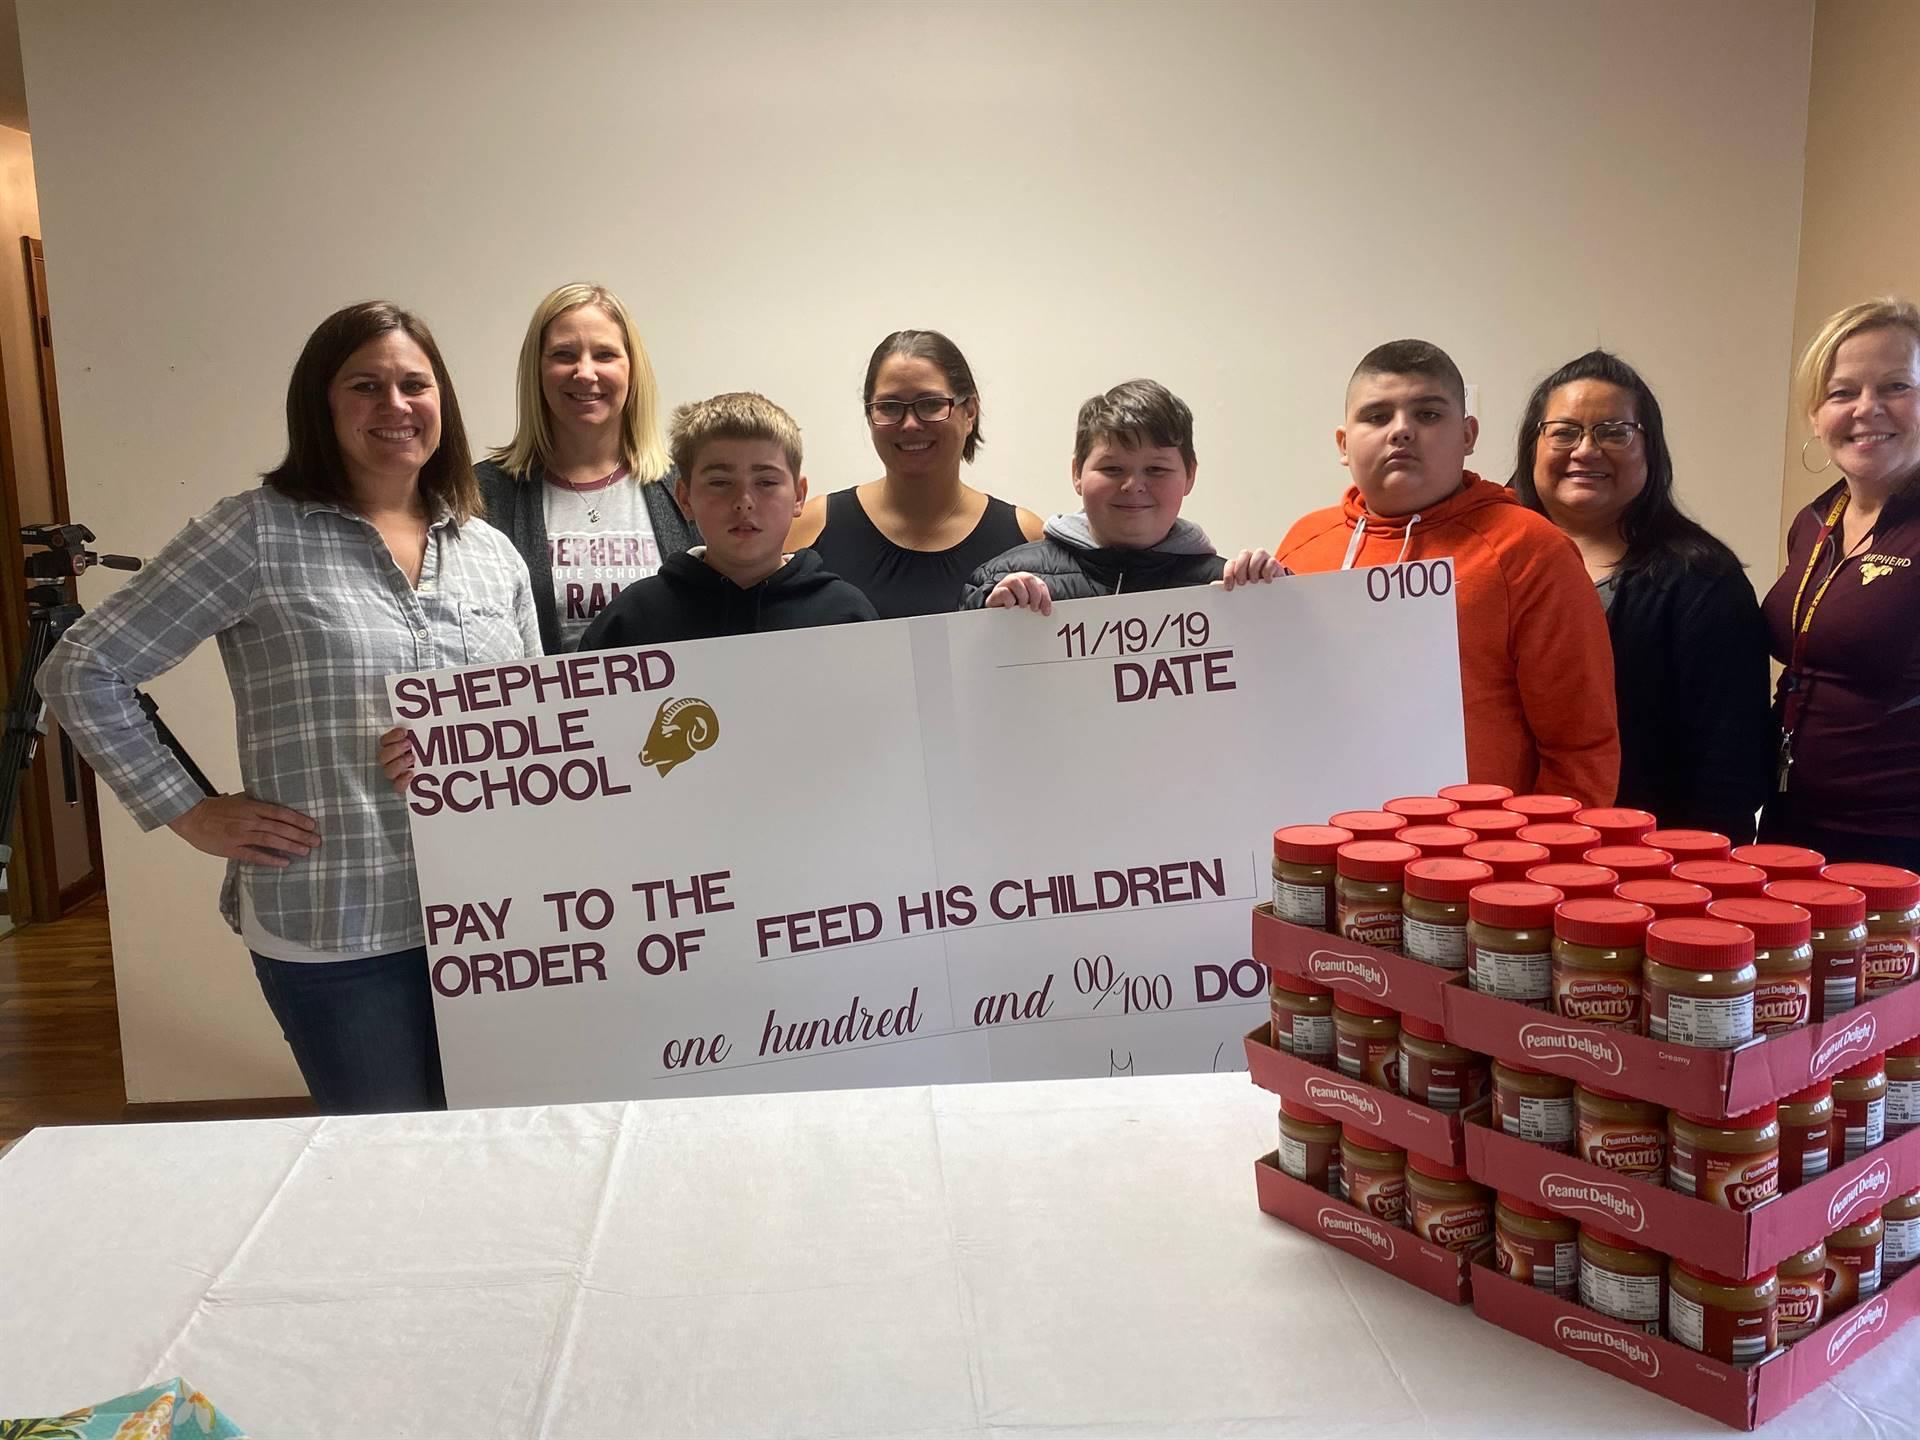 Shepherd Donation - Feed His Children